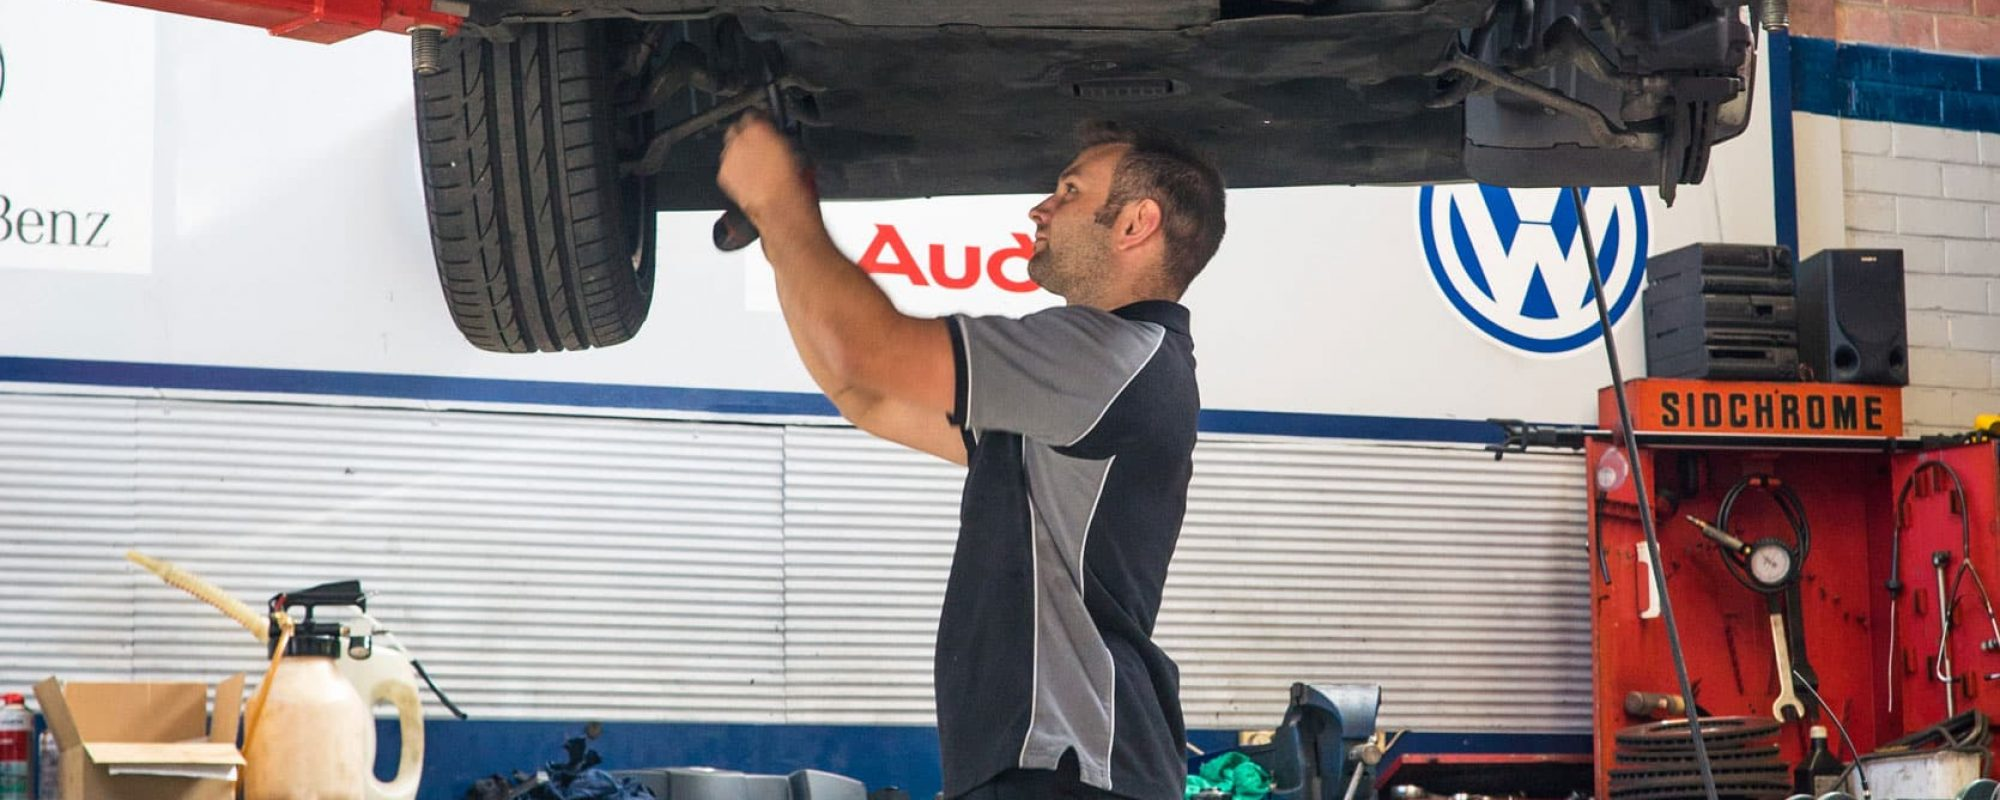 german-automovie-mechanic-west-perth